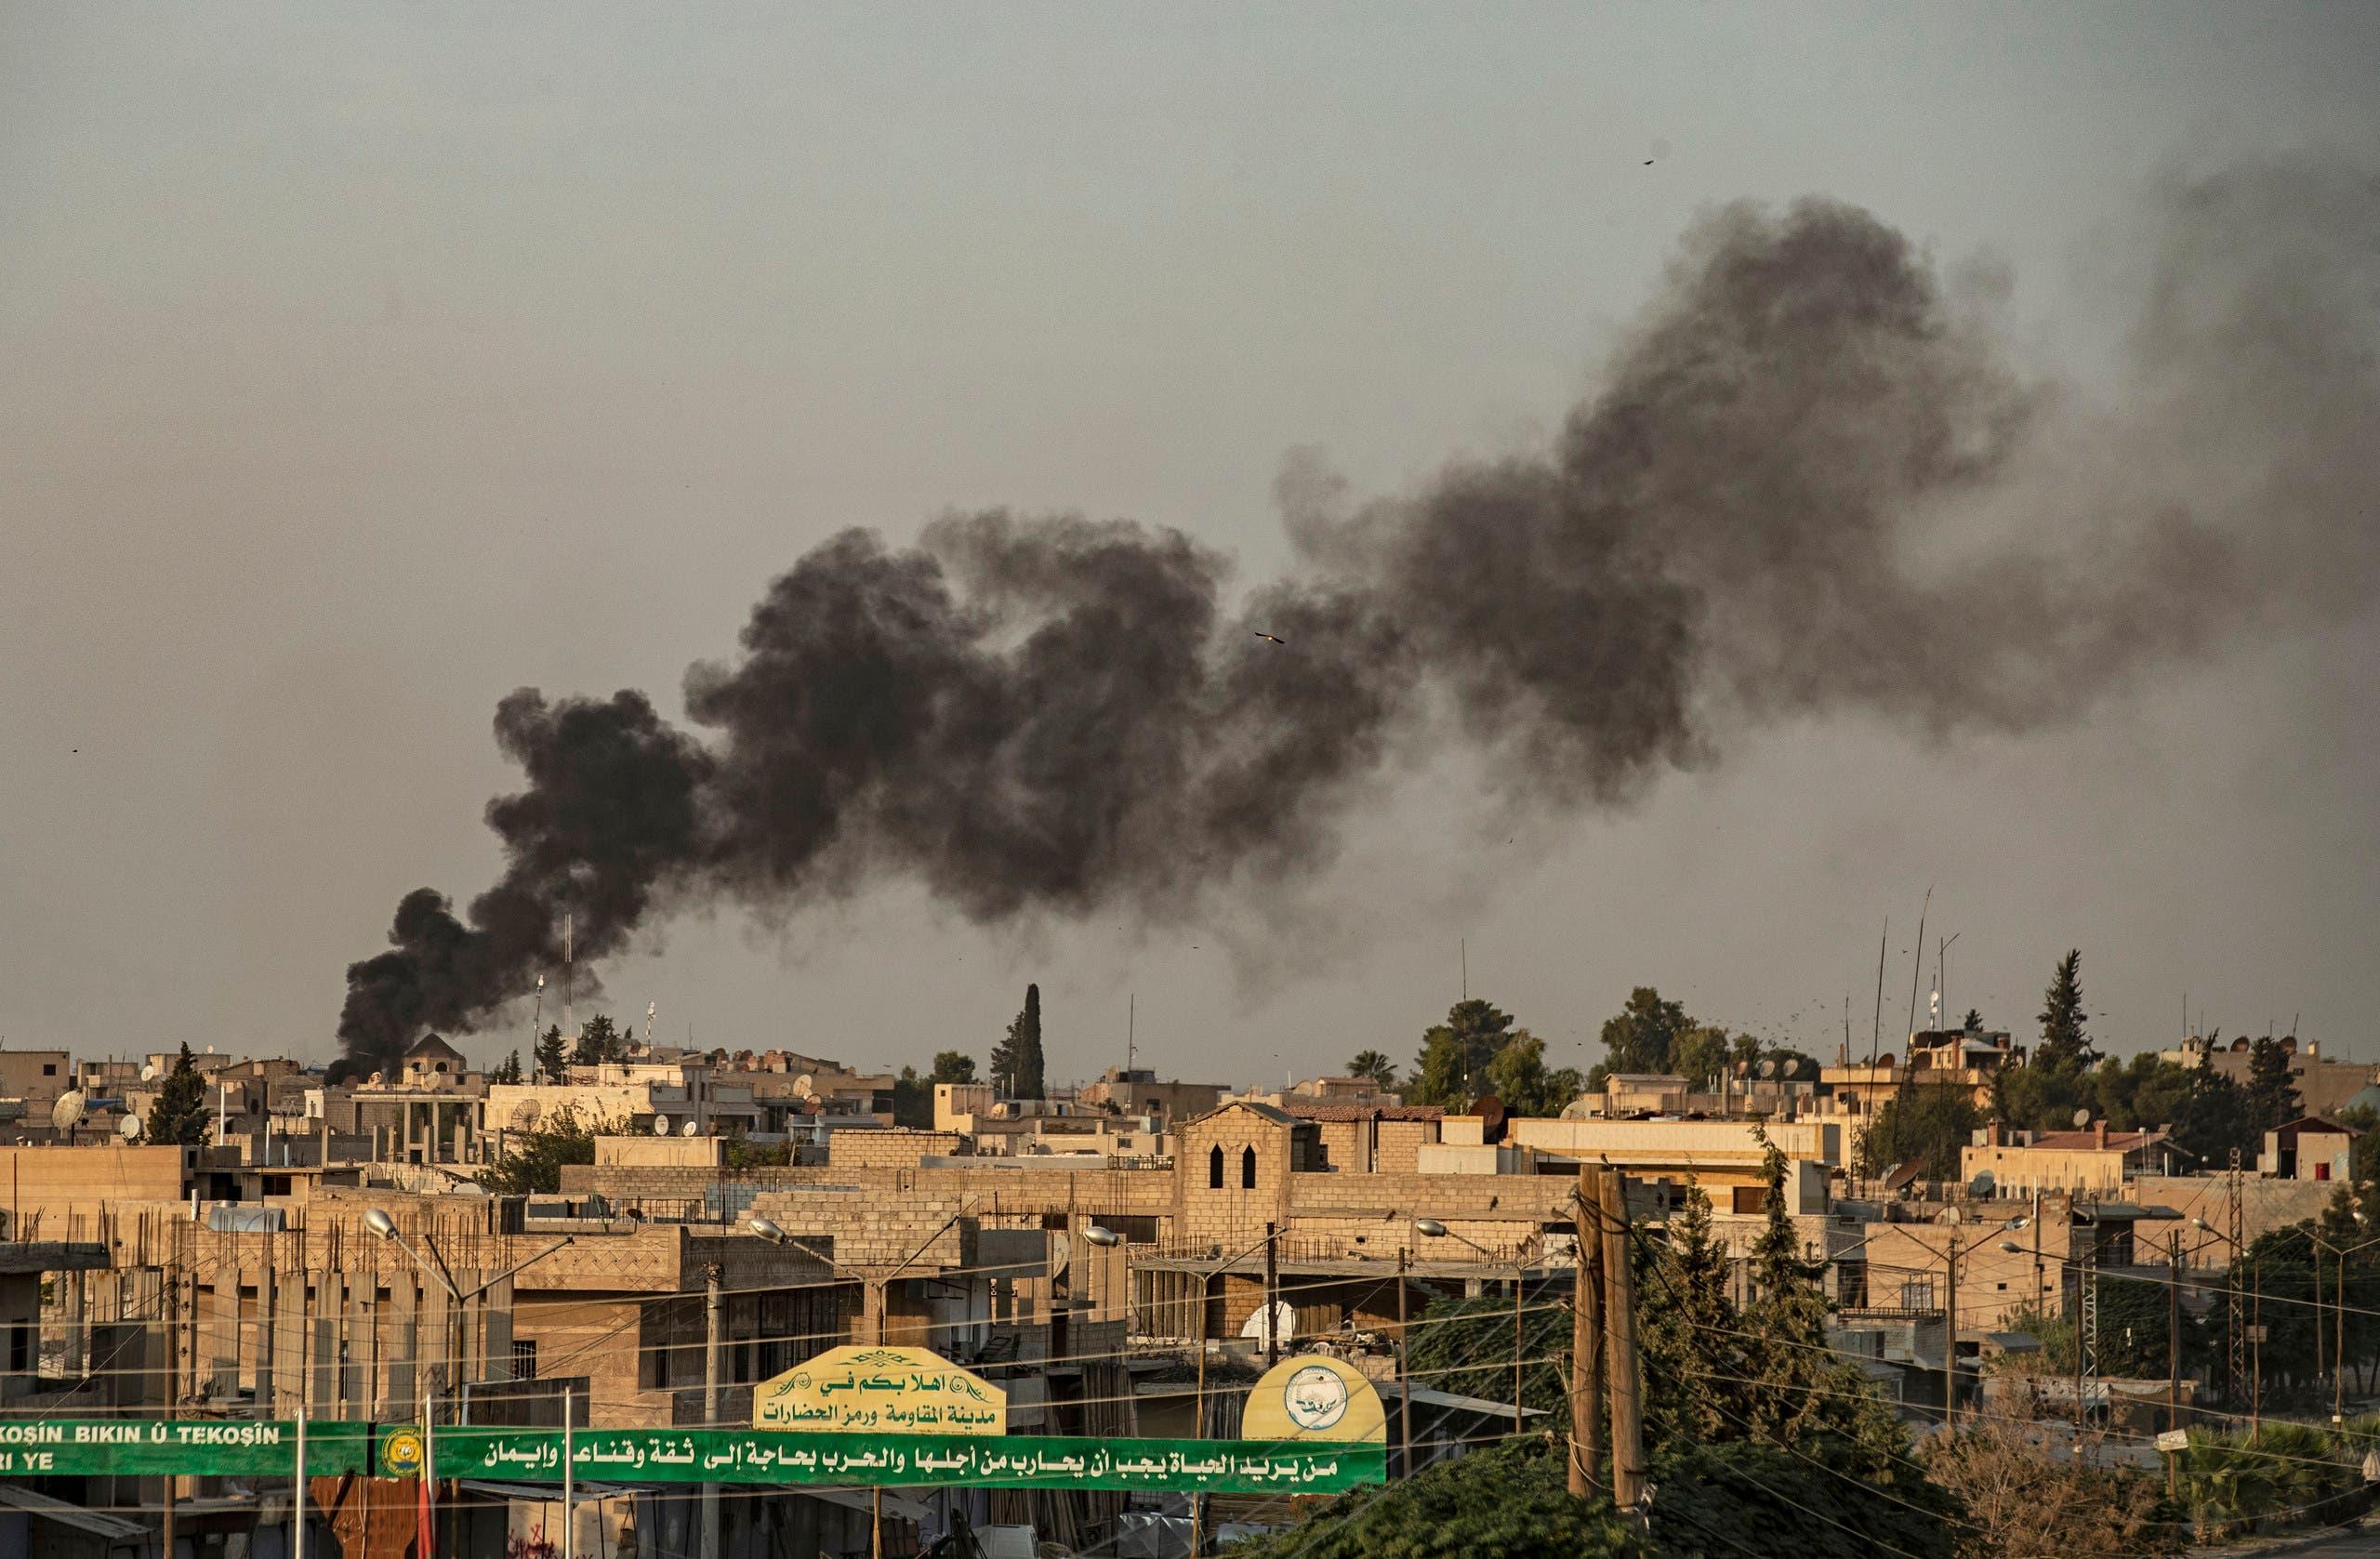 قصف تركي على بلدات شمال شرق سوريا (فرانس برس)